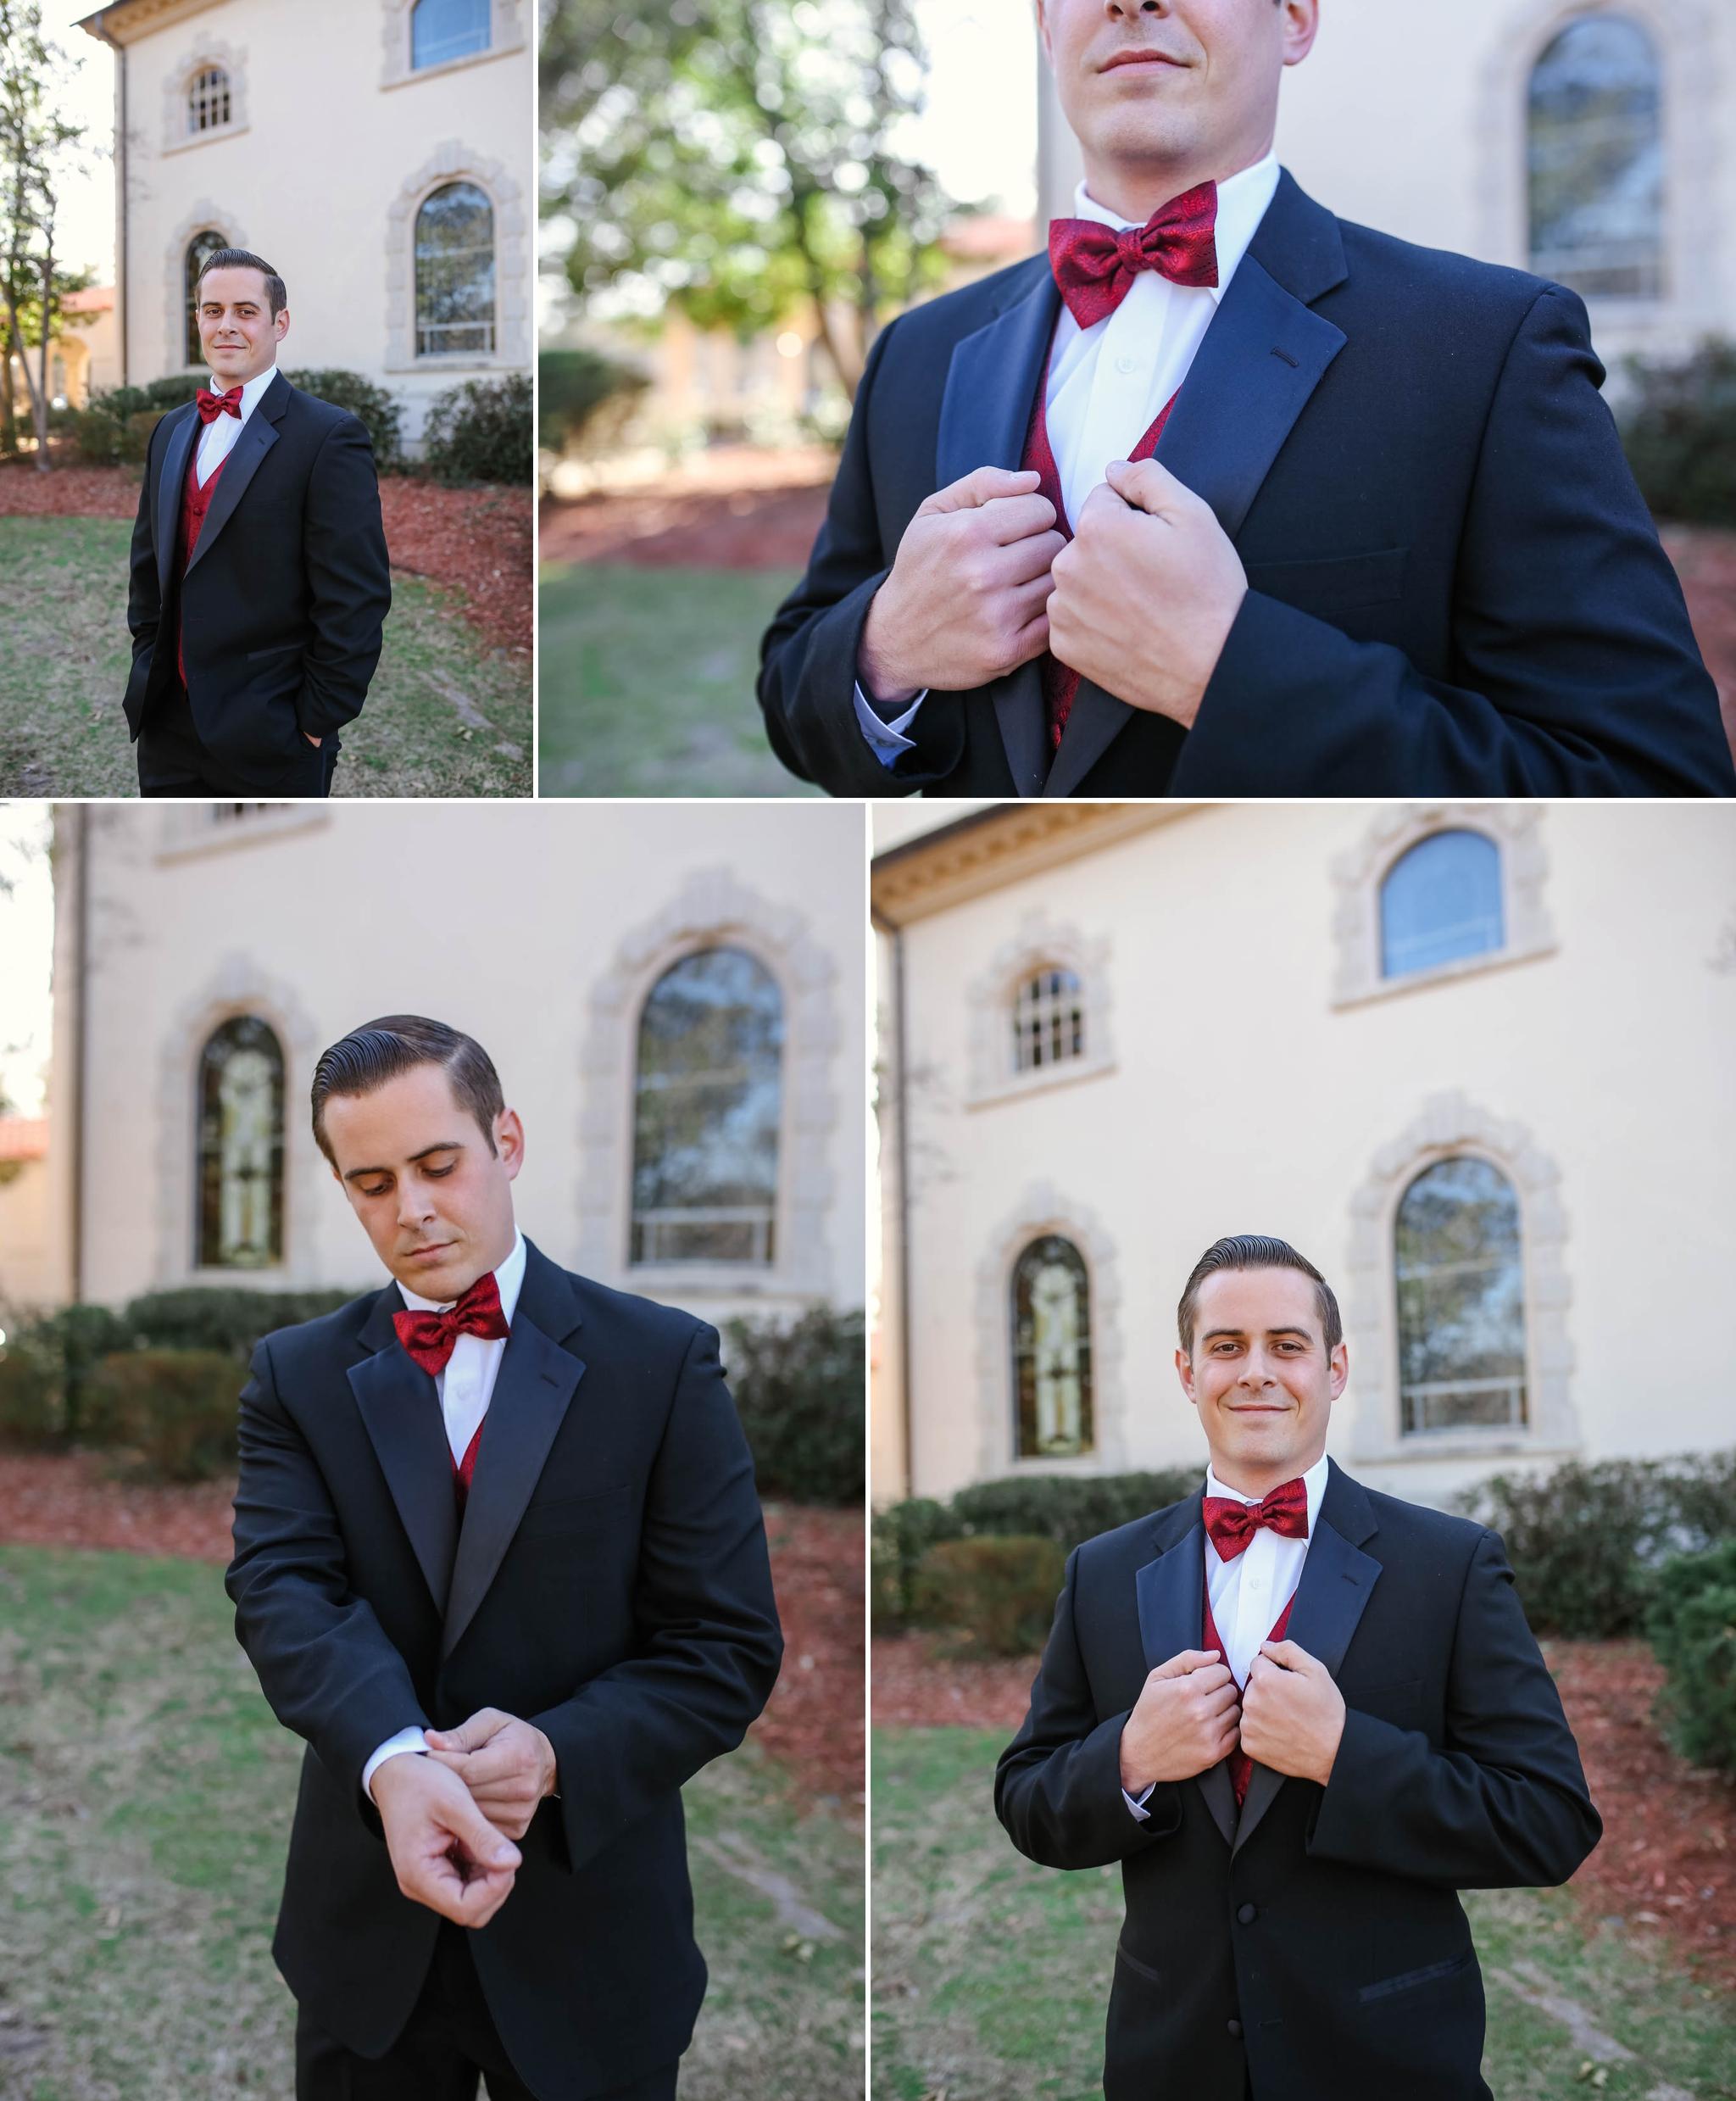 Fort Bragg NC Main Post Chapel Wedding - Fayetteville North Carolina Wedding Photography - Johanna Dye